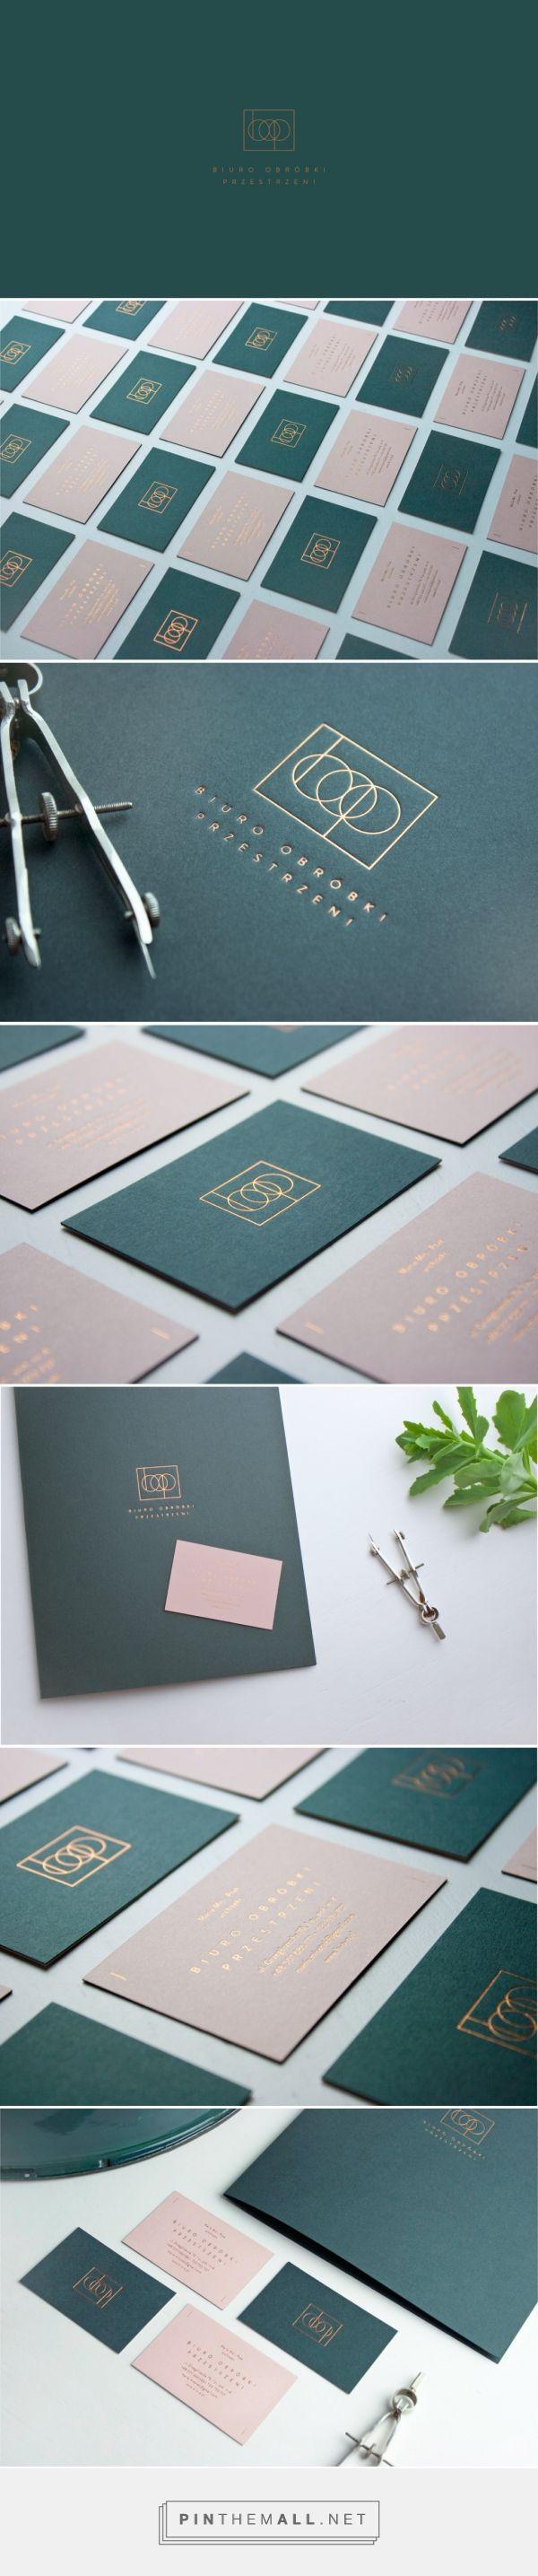 Biuro Obróbki Przestrzeni Architect Branding by Paulina Zbylut | Fivestar Branding Agency – Design and Branding Agency & Curated Inspiration Gallery